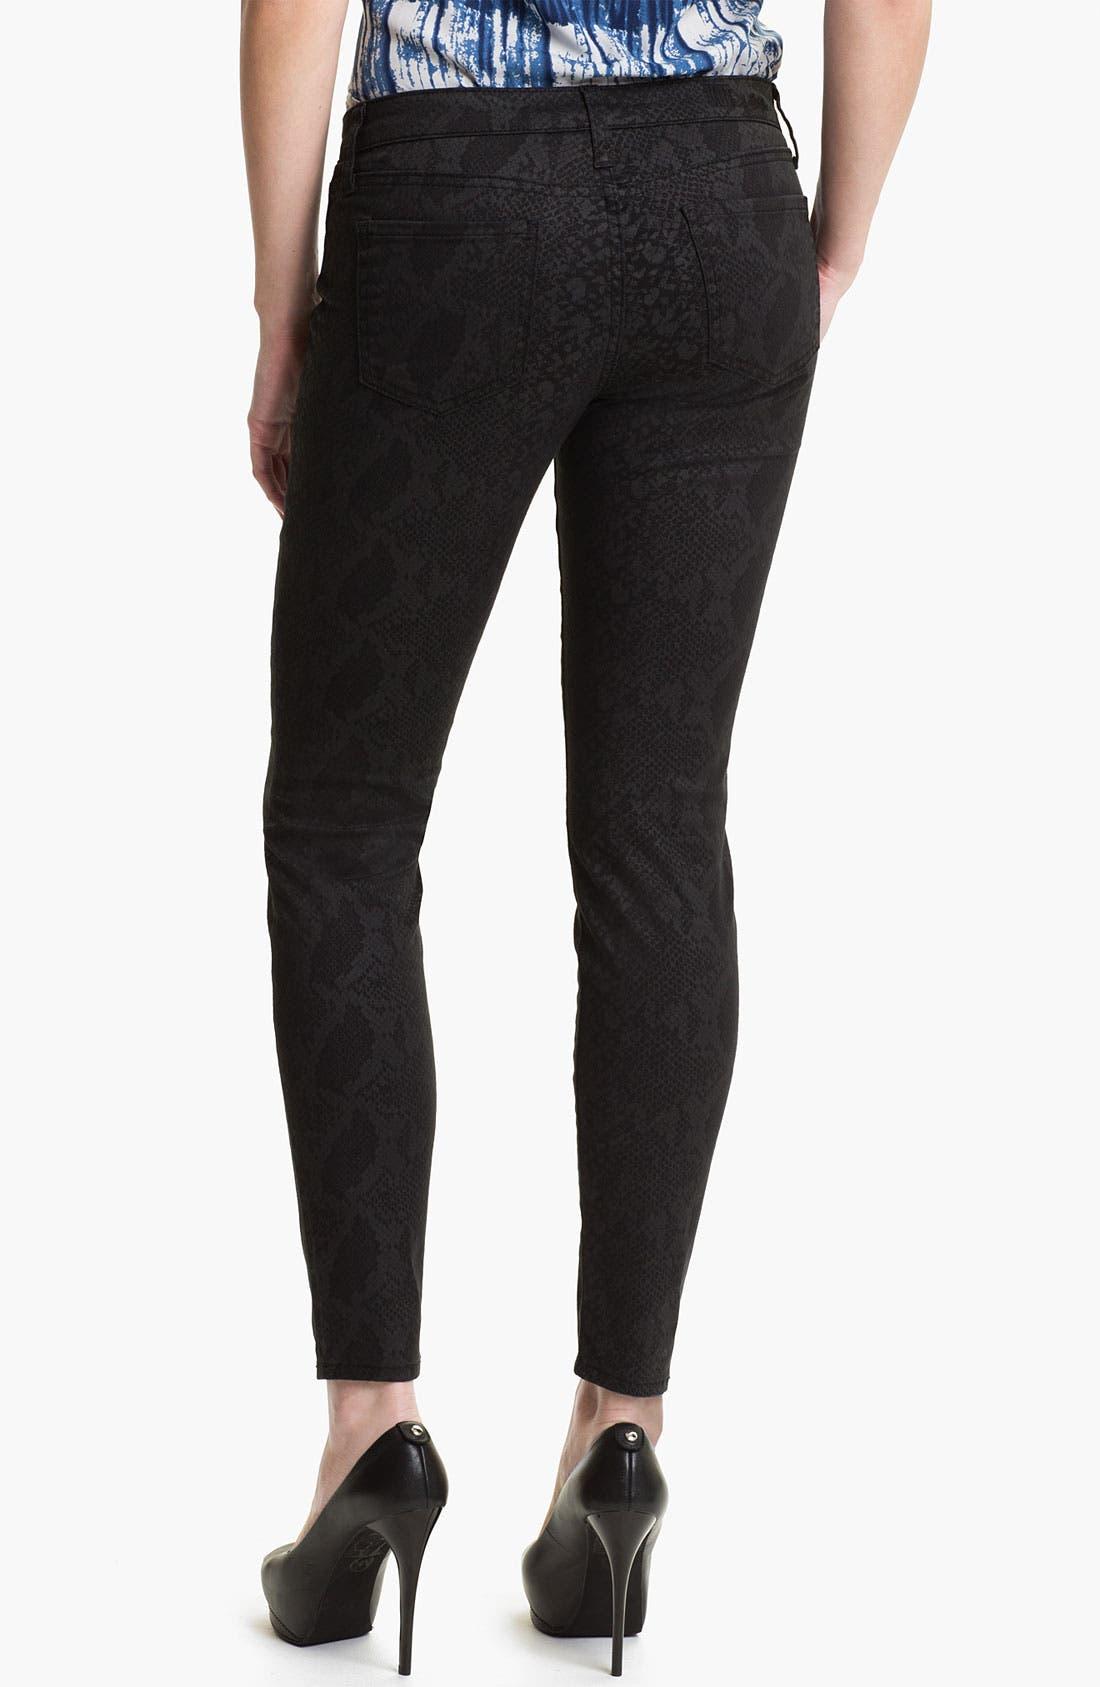 Alternate Image 2  - KUT from the Kloth 'Jennifer' Skinny Stretch Jeans (Snakeskin Print) (Online Exclusive)